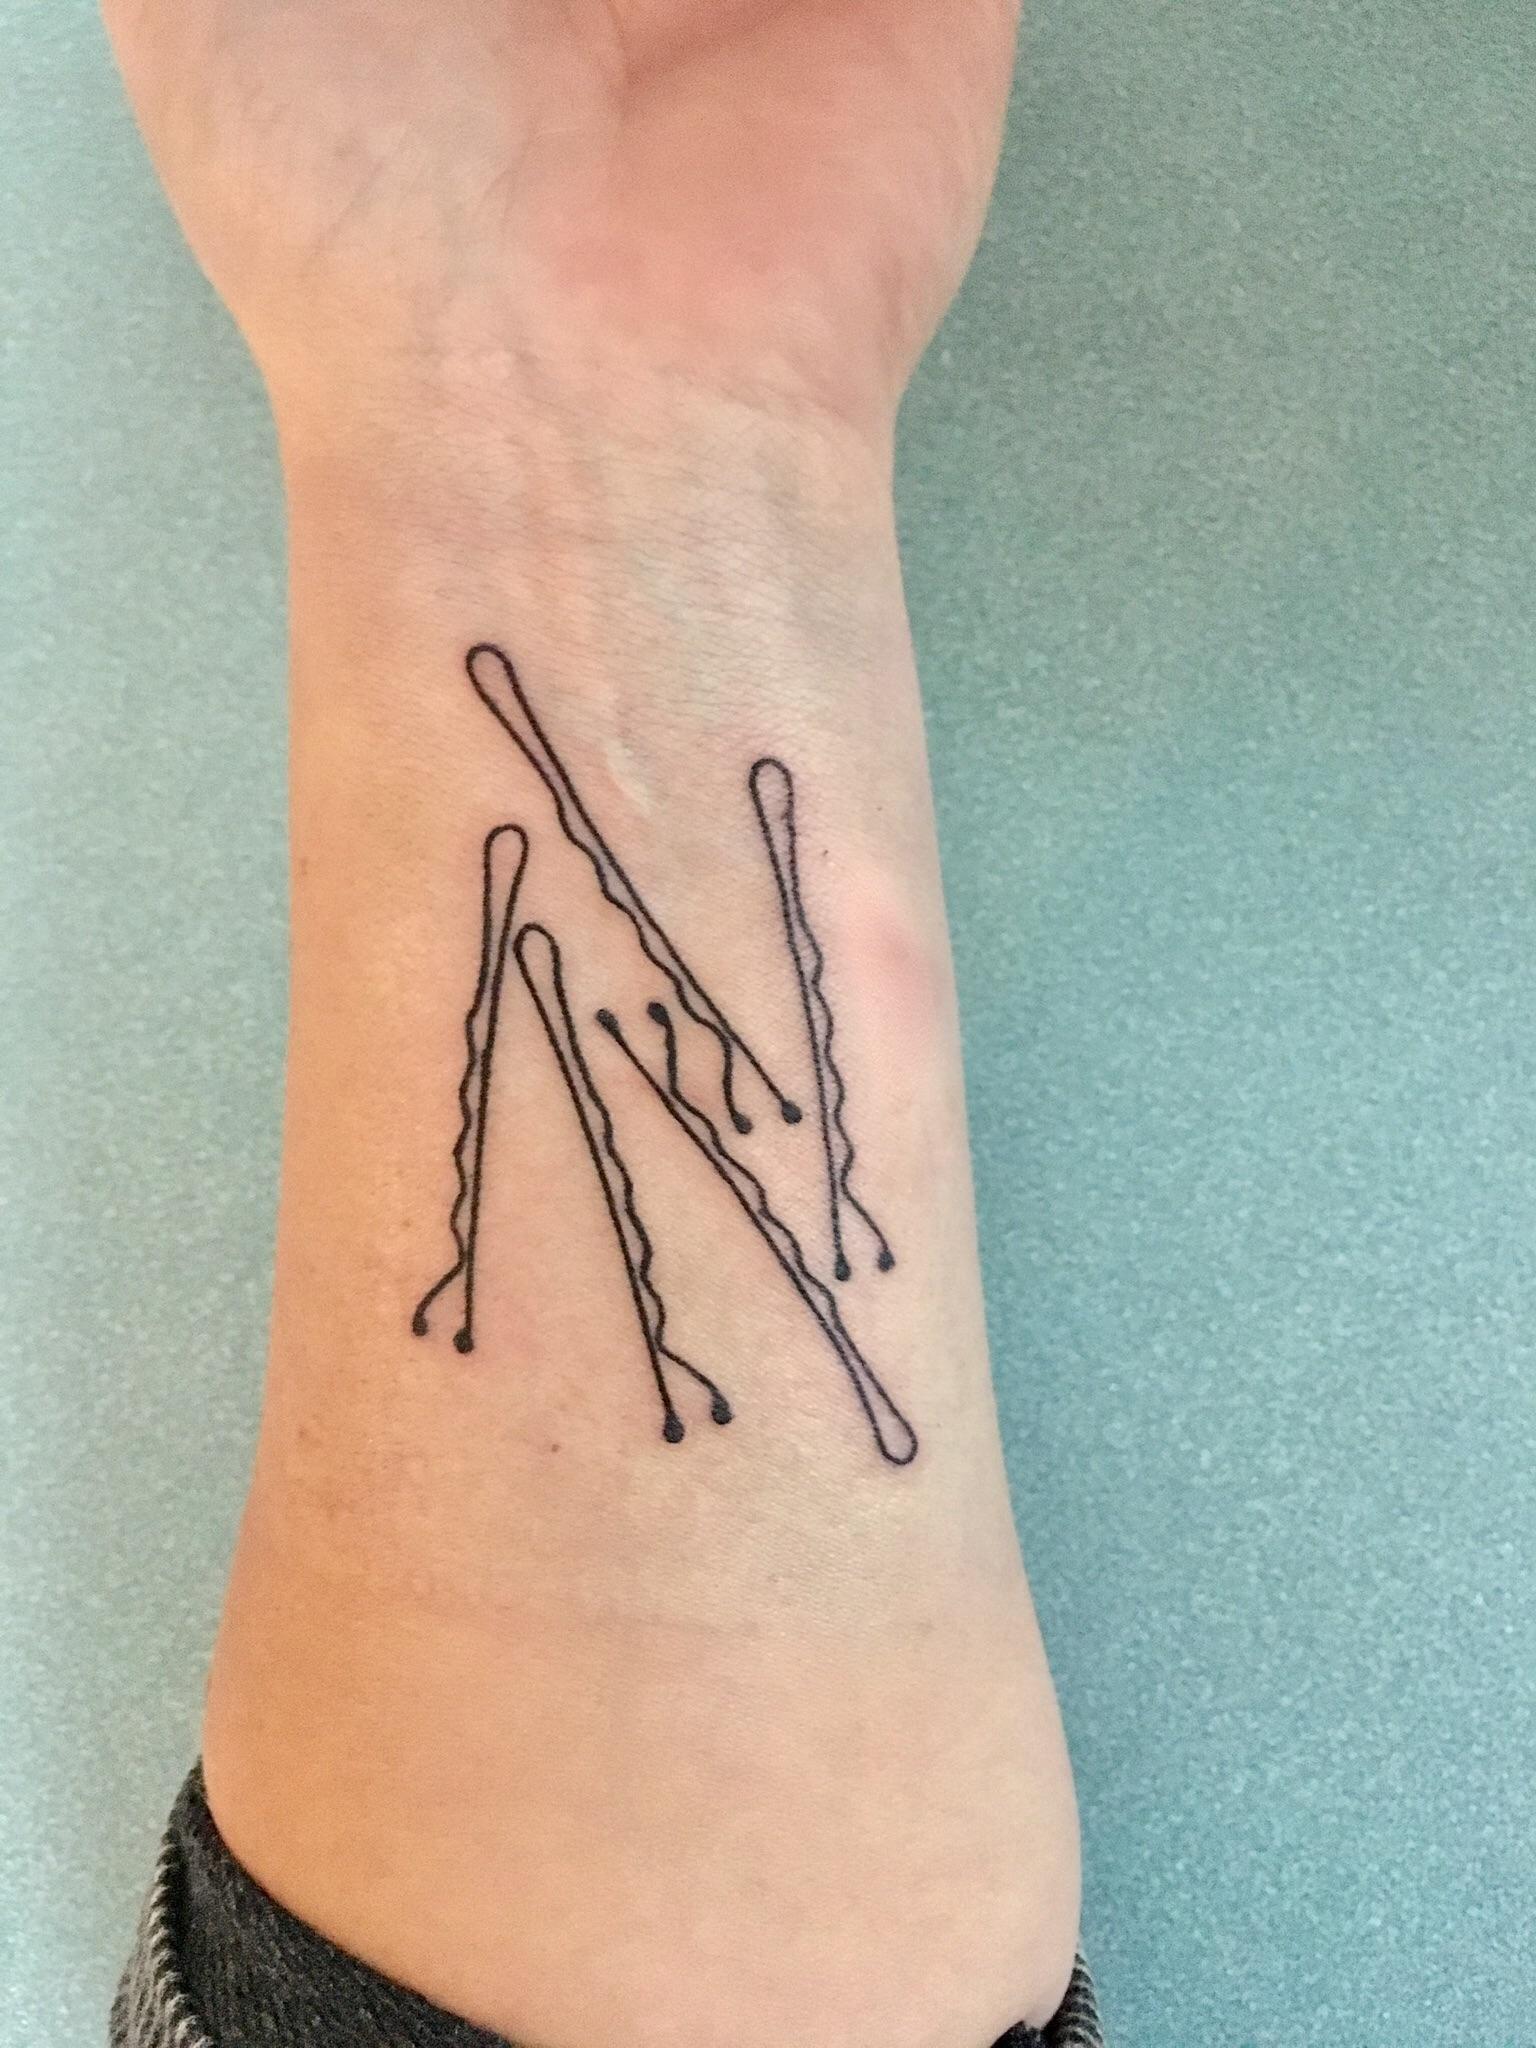 Bobby Pin Tattoo Meaning : bobby, tattoo, meaning, Bobby, Pins,, Level, Tattoo, Pawtucket, Tattoos